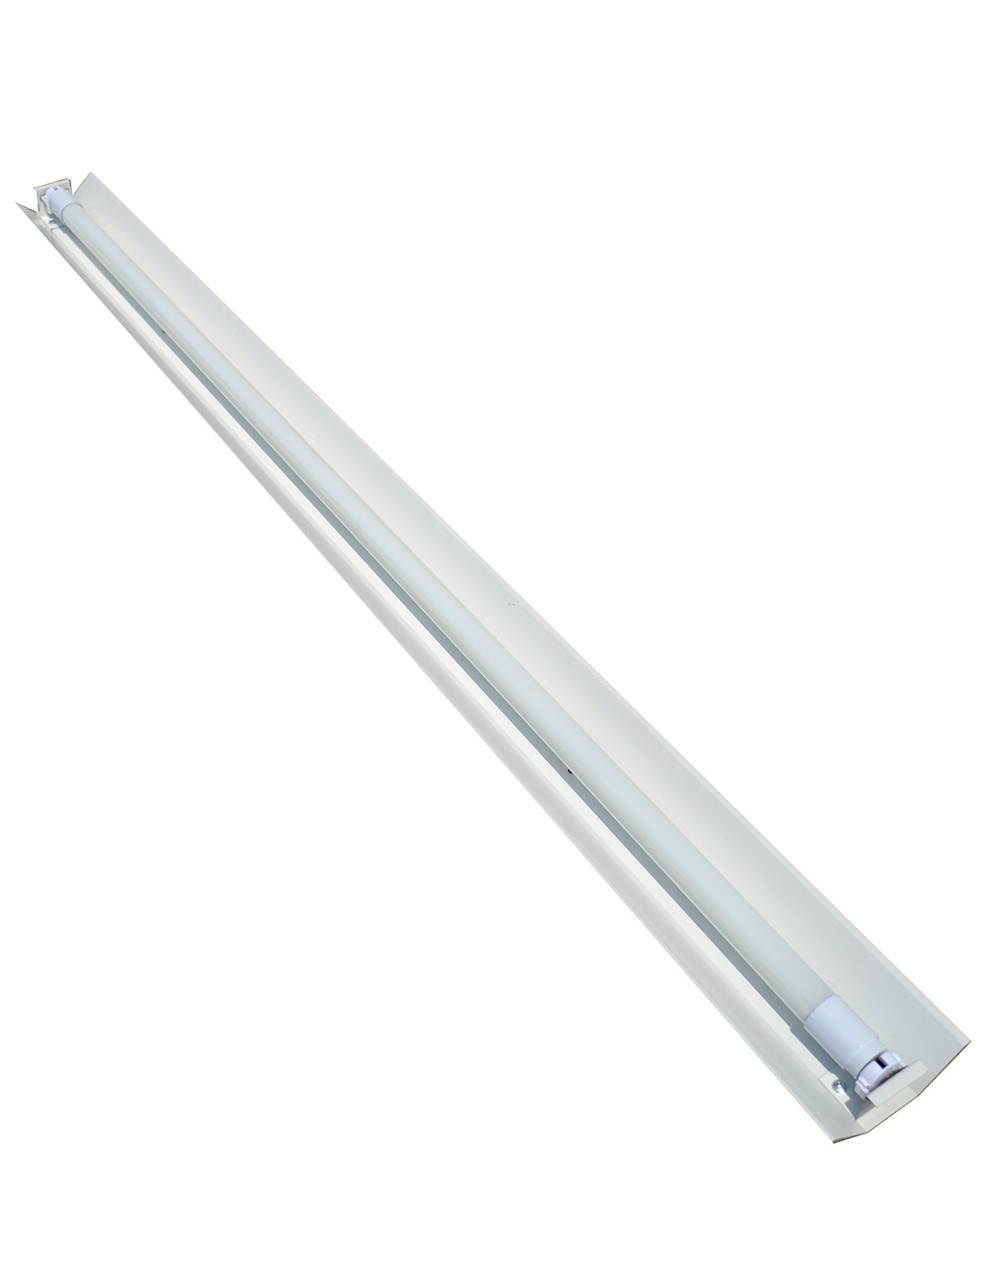 Светильник открытый под led лампу Т8 120см СПВ 01-1200 компакт MSK Electric